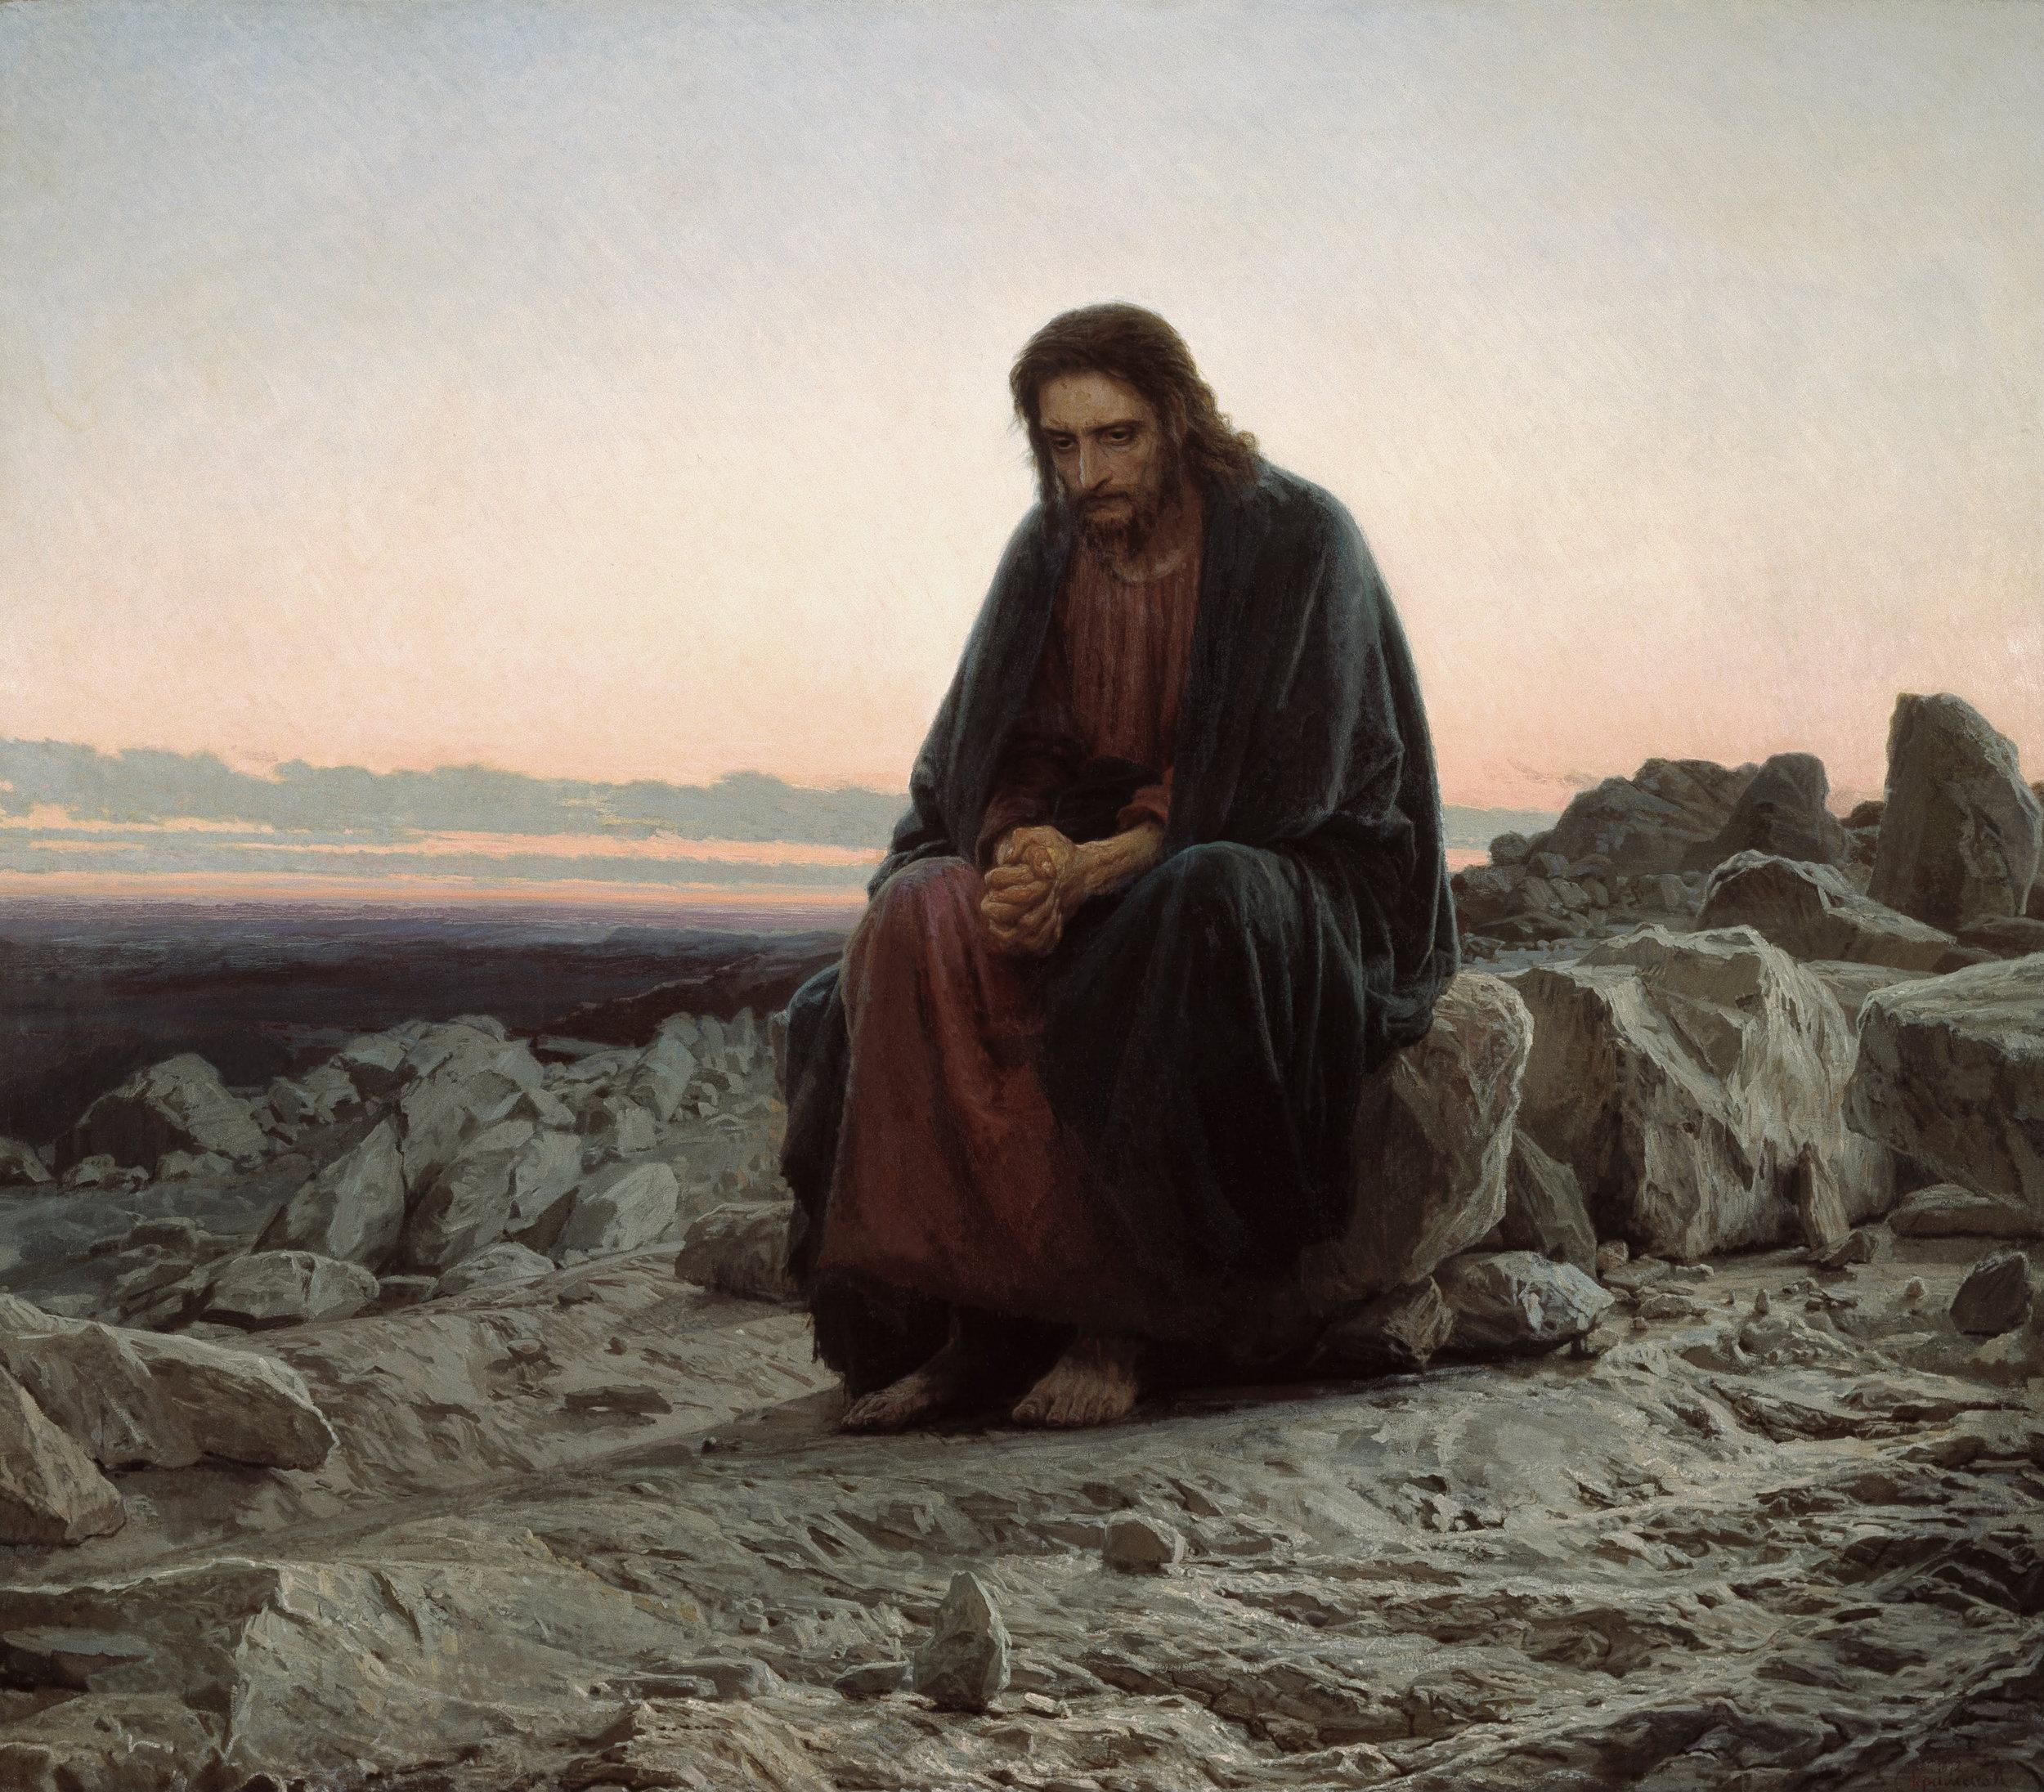 Christ in the Wilderness, by Ivan Kramskoy (1872).